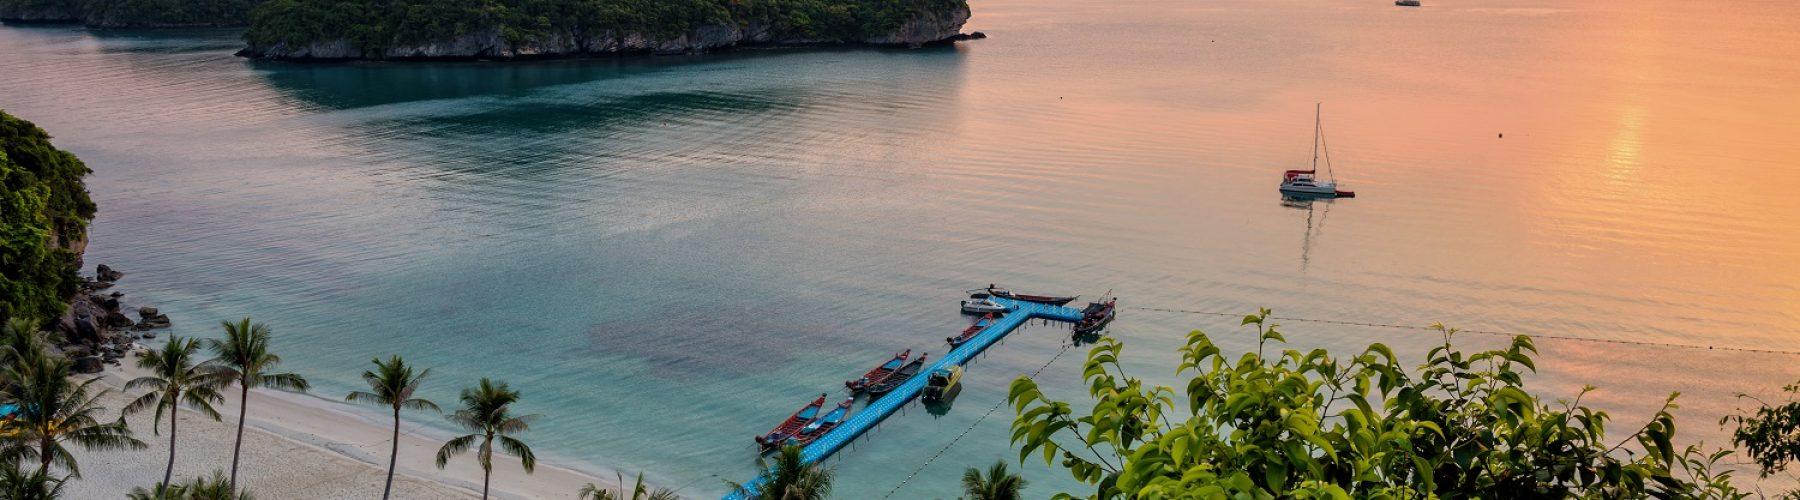 High angle view beautiful natural landscape of beach sea island and bridge pier for tourist at Ko Wua Ta Lap island during sunrise in Mu Ko Ang Thong National Marine Park, Surat Thani, Thailand